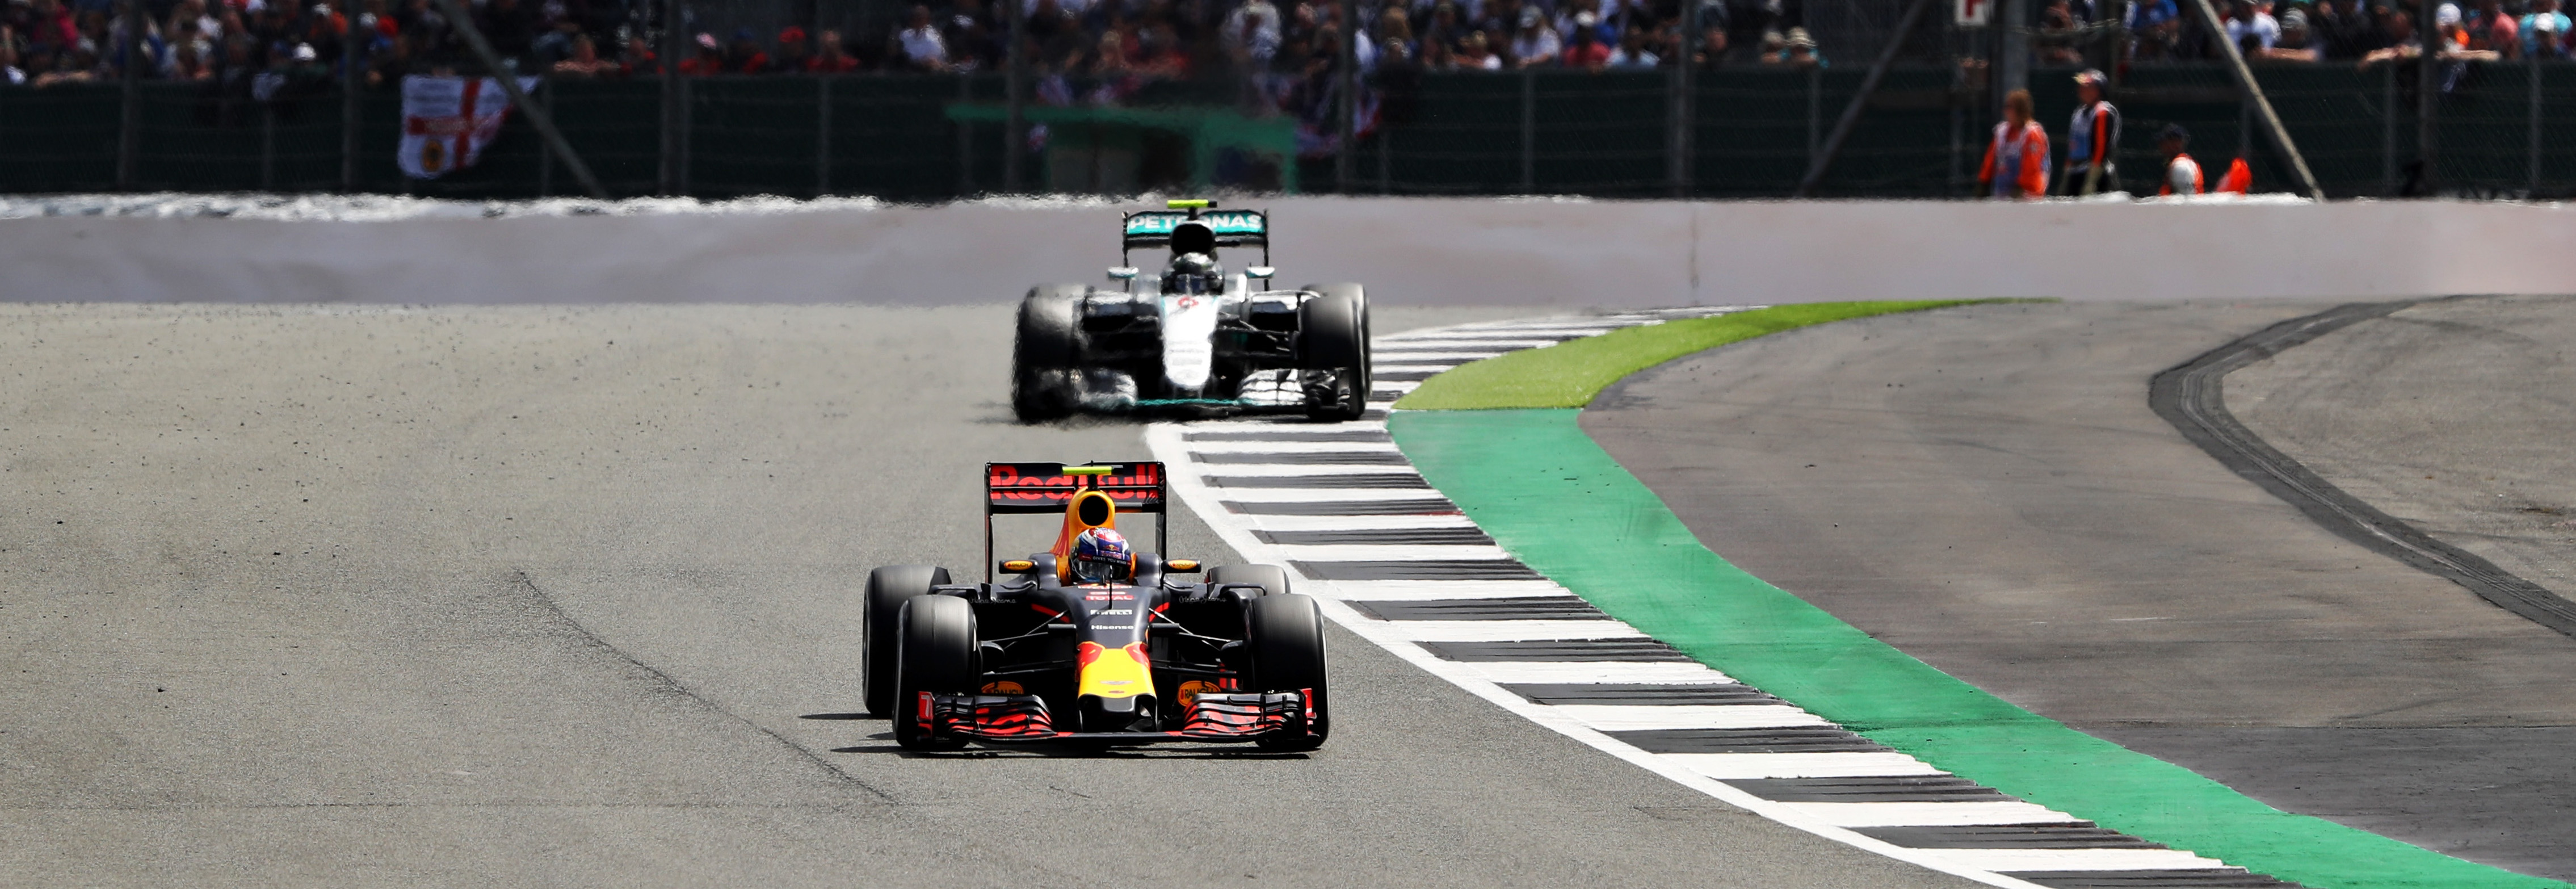 Formule 1 kalender iphone 6